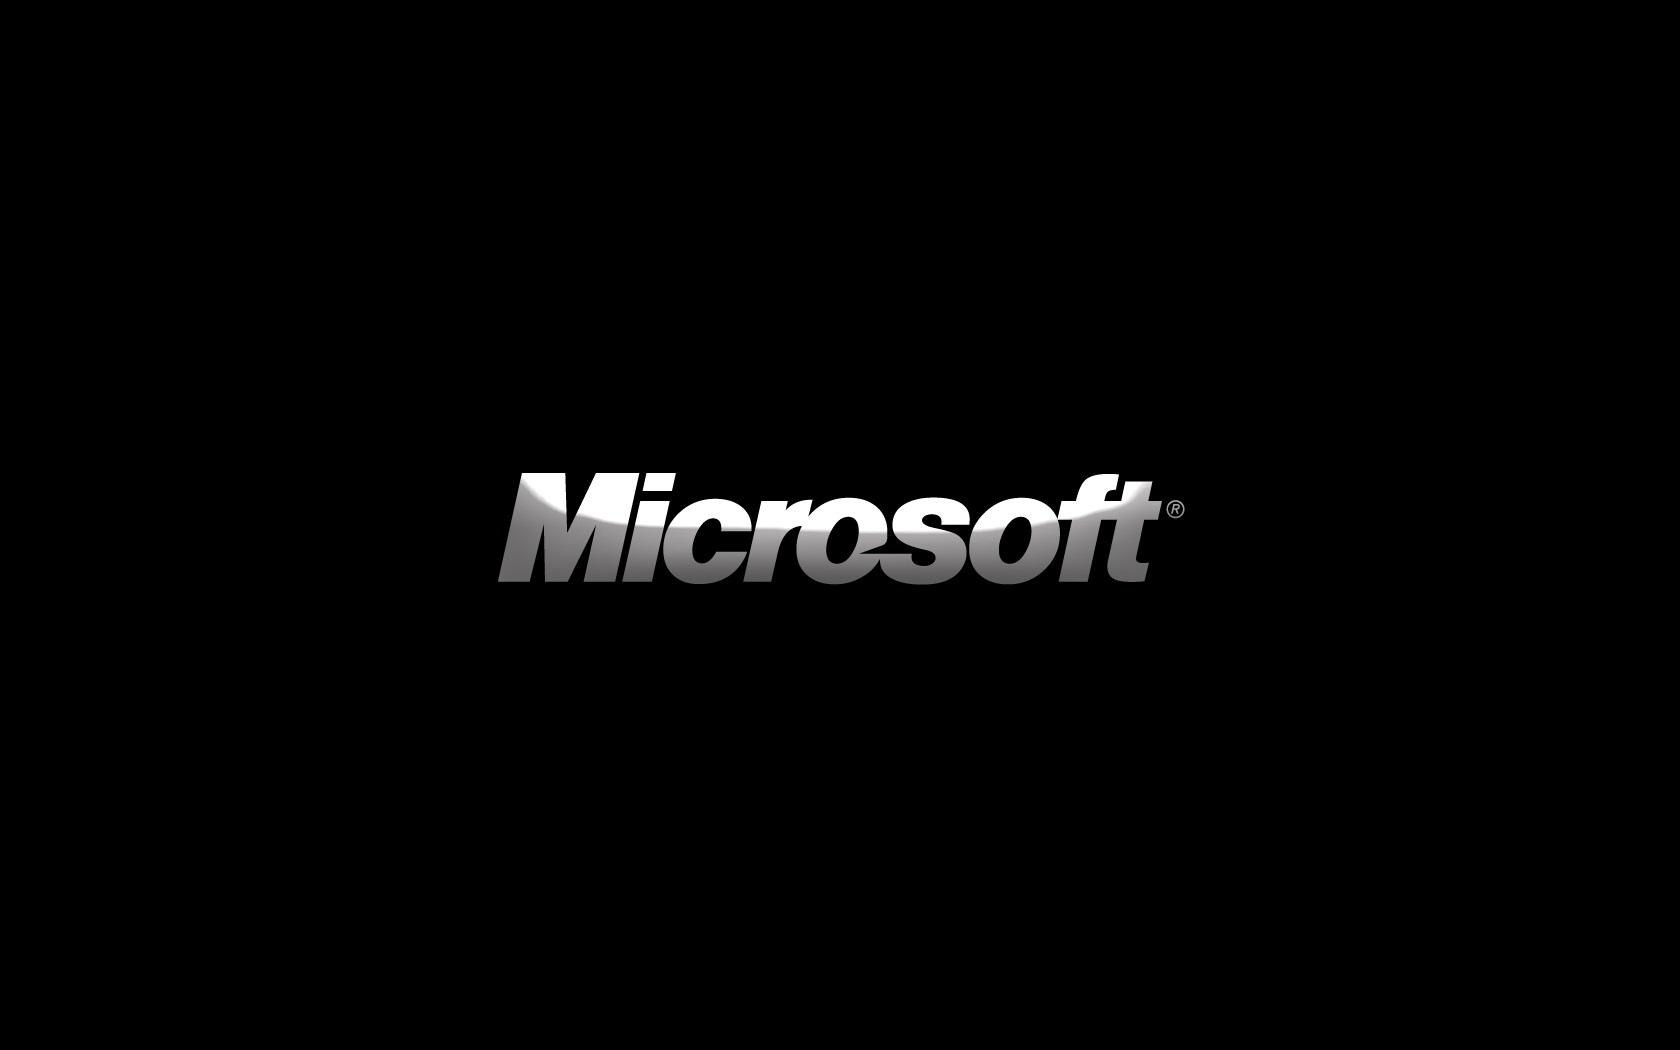 desktop backgrounds microsoft desktop background microsoft office 1680x1050